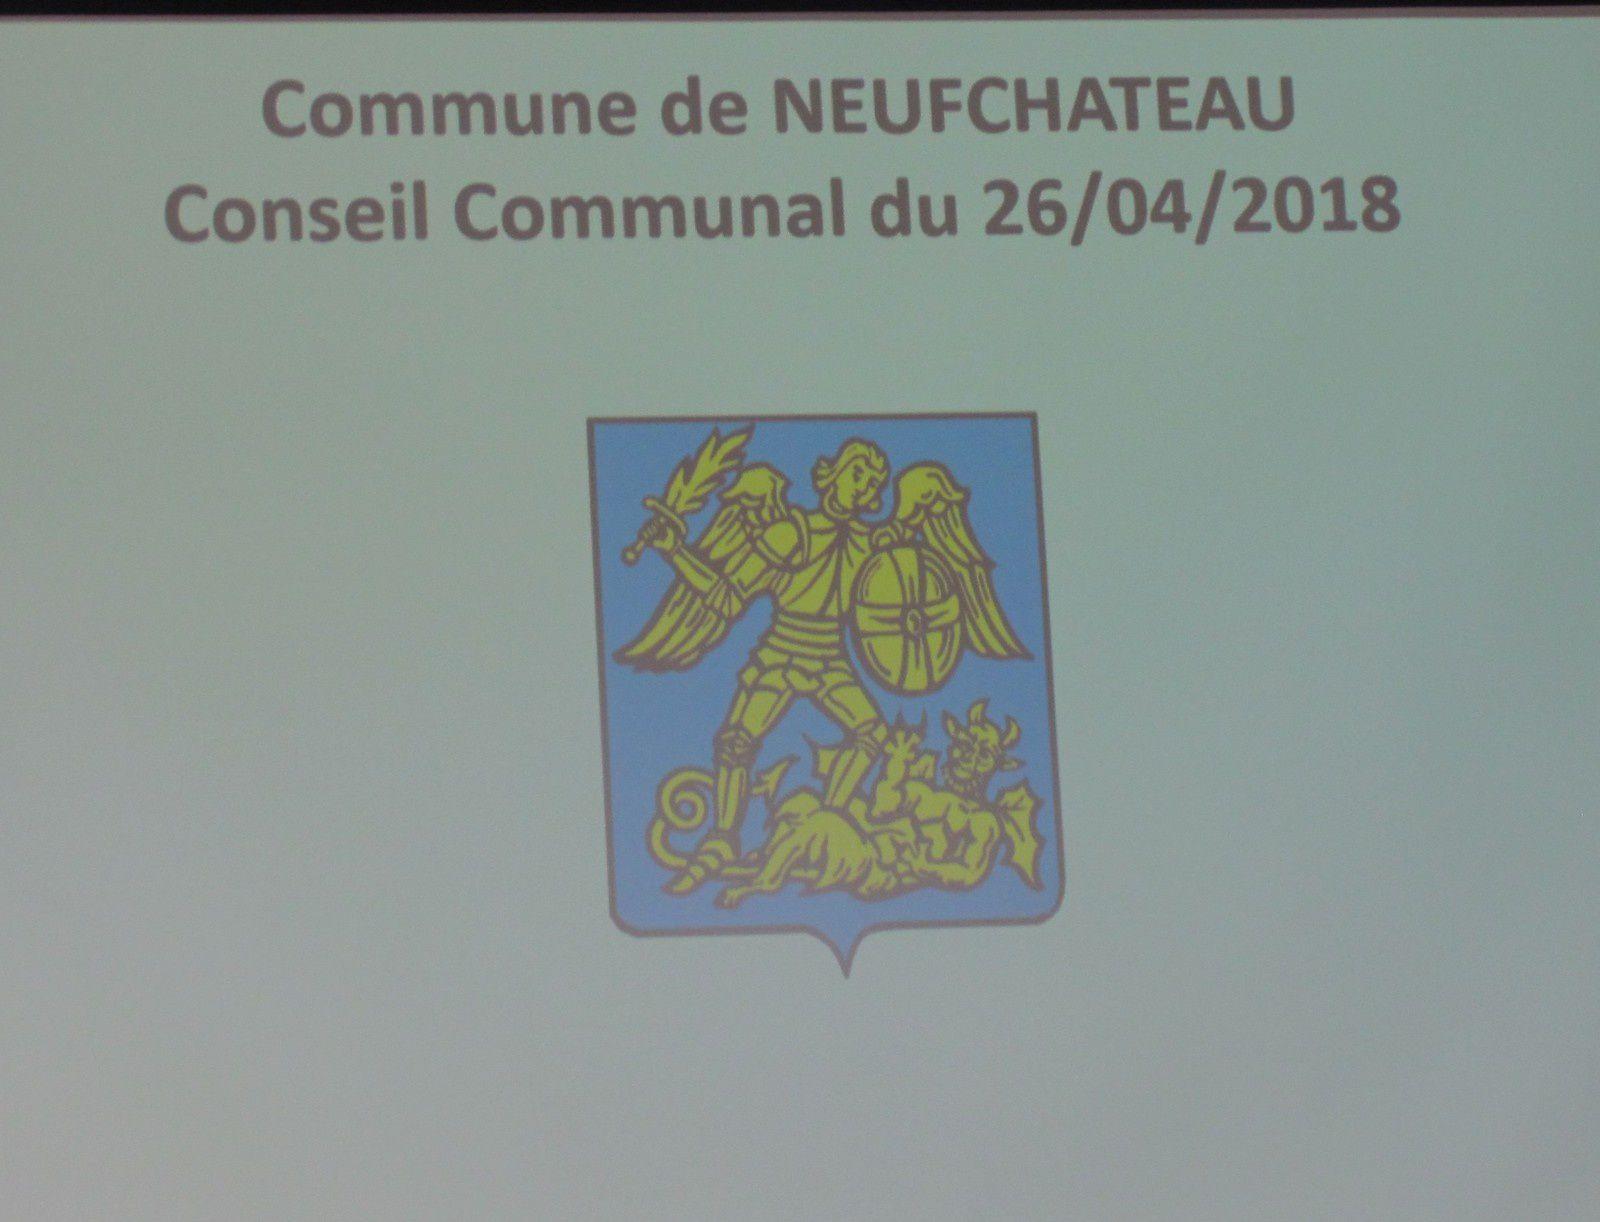 Le conseil communal